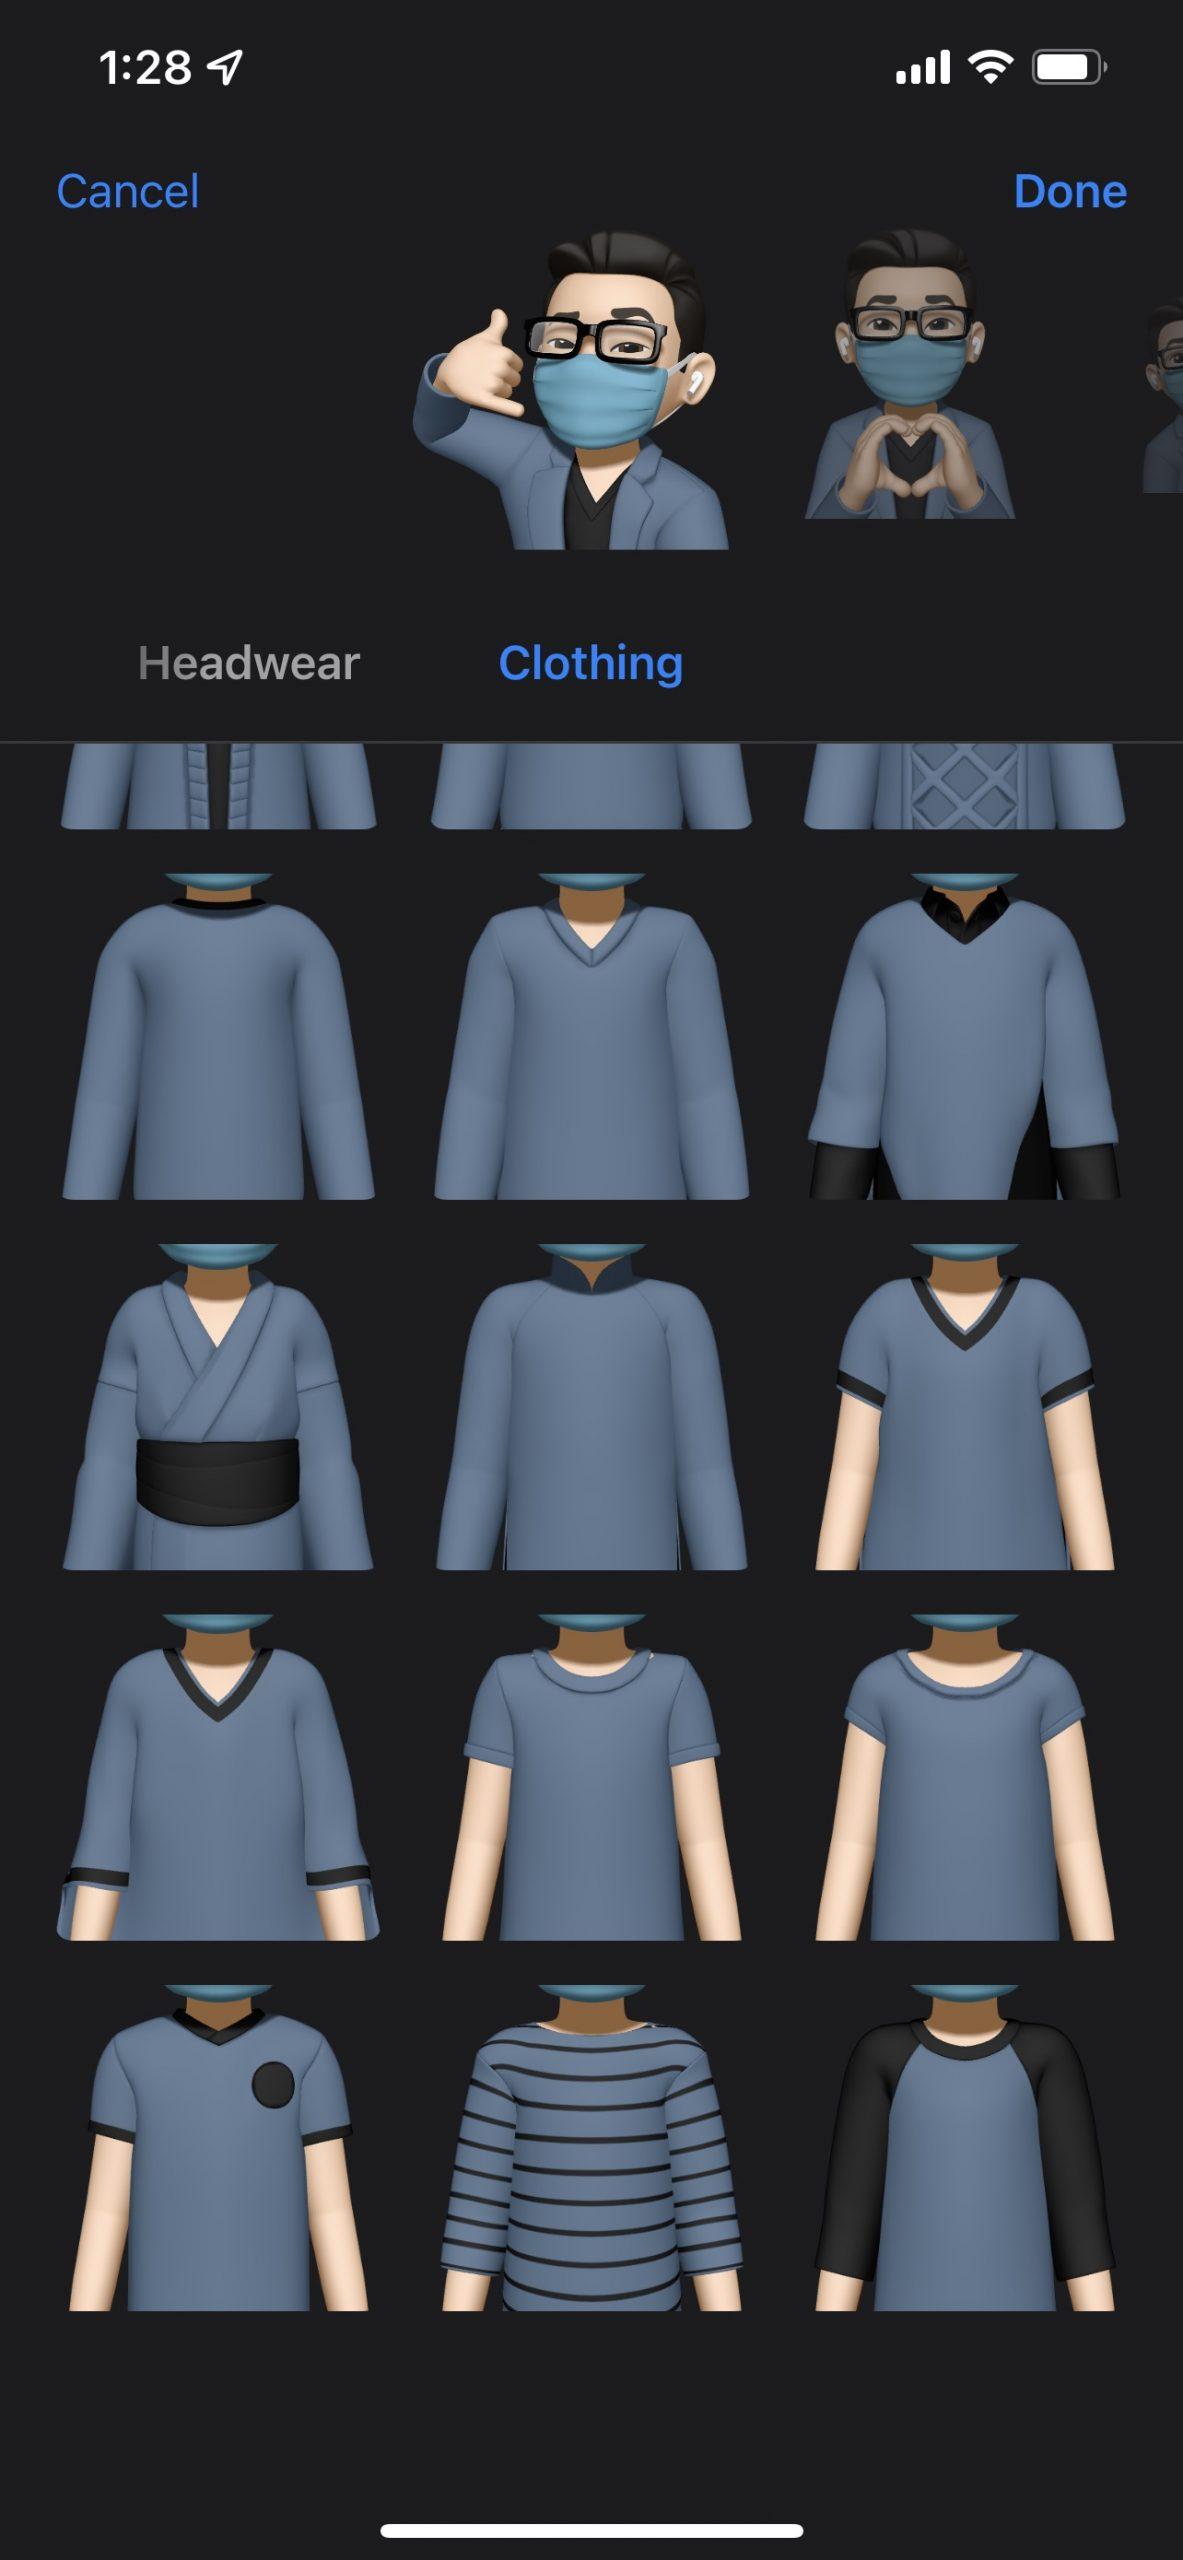 iOS 15 beta 2 memoji outfits